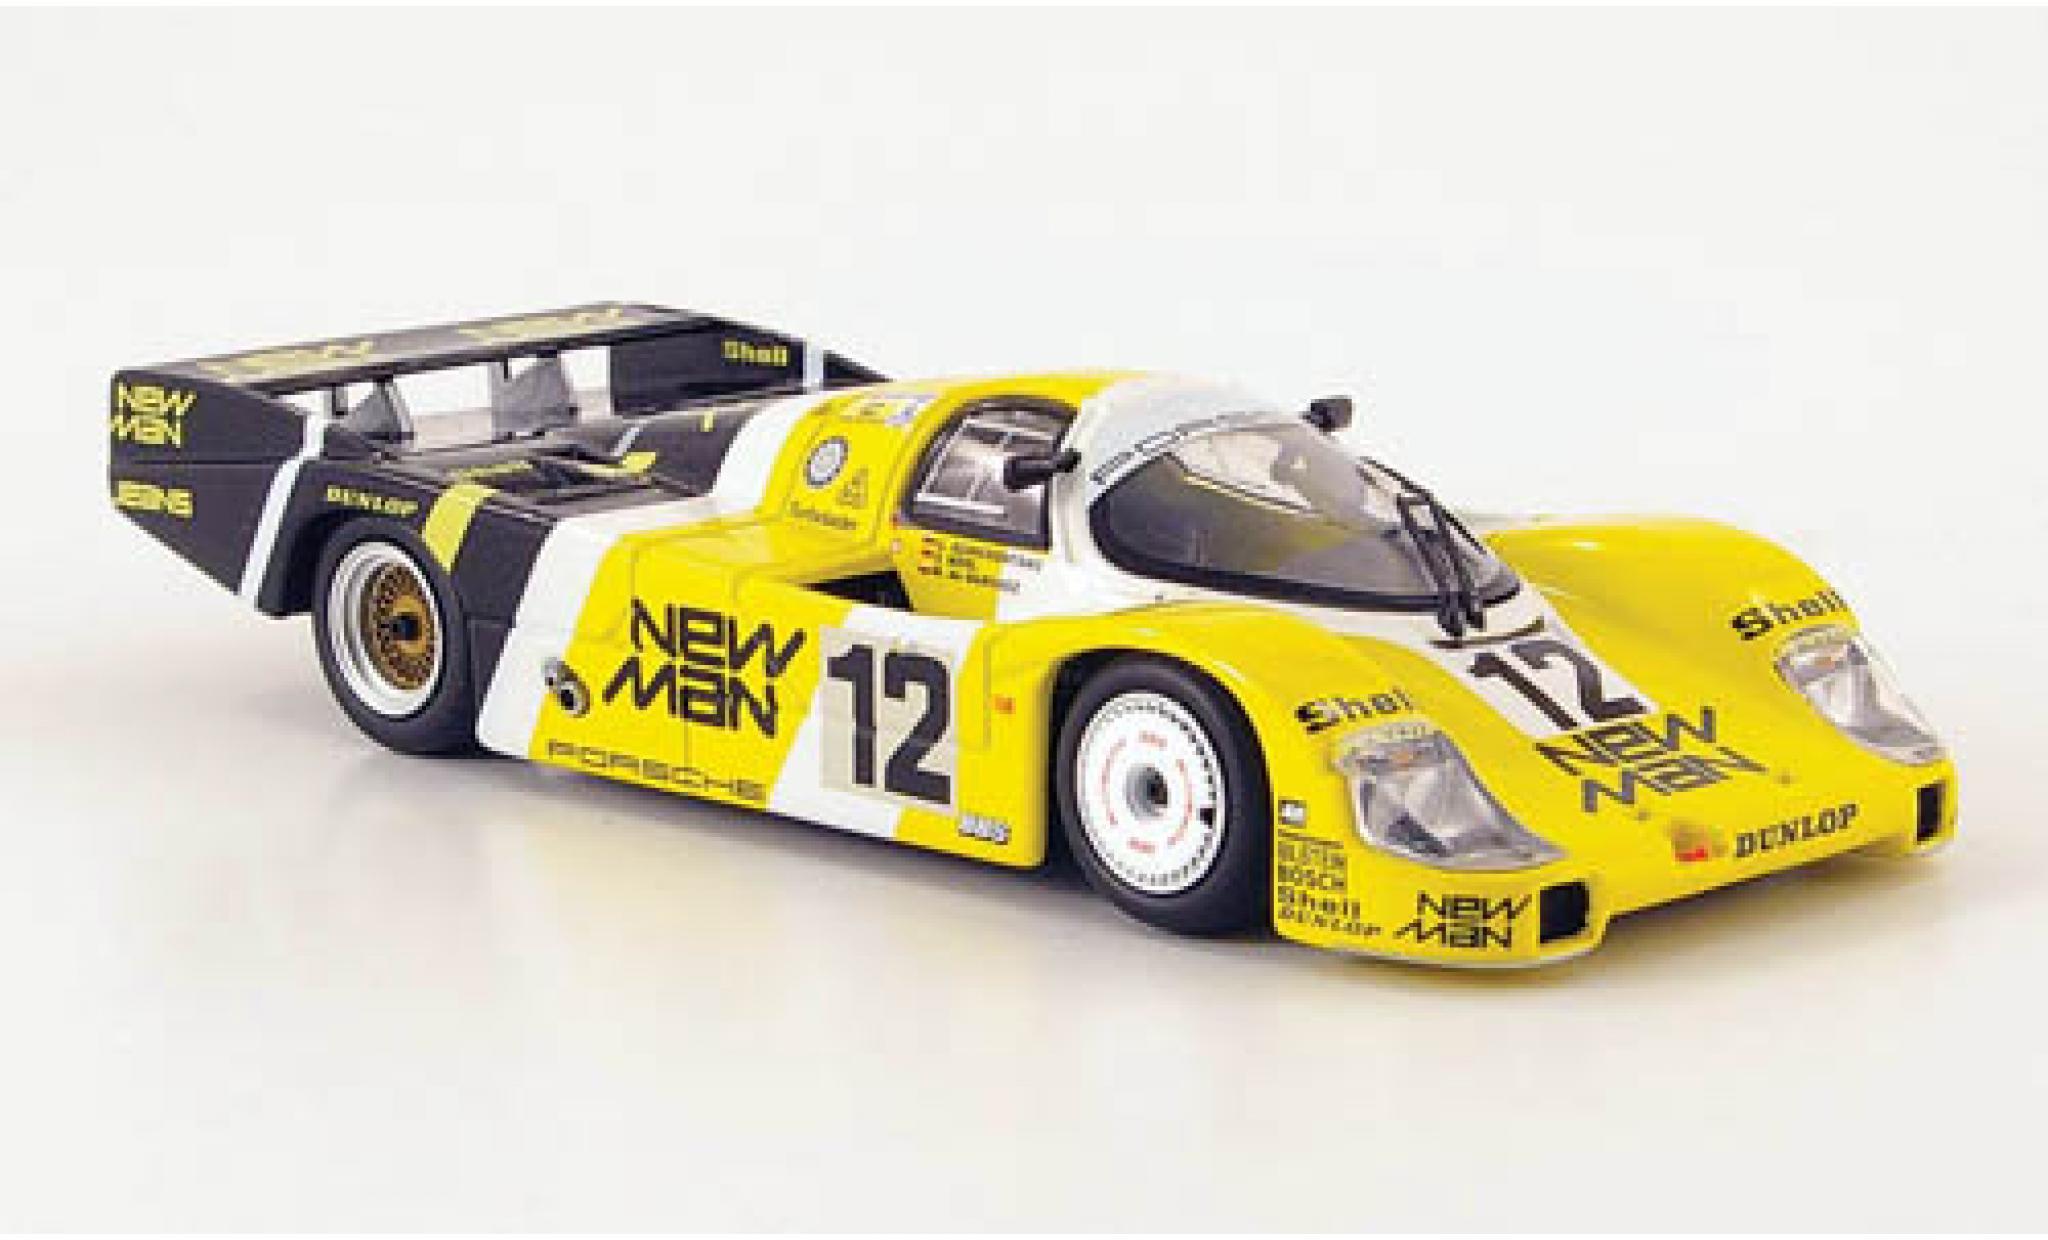 Porsche 956 1983 1/43 Minichamps L No.12 Joest Racing New Man 24h Le Mans V.Merl/C.Schickentanz